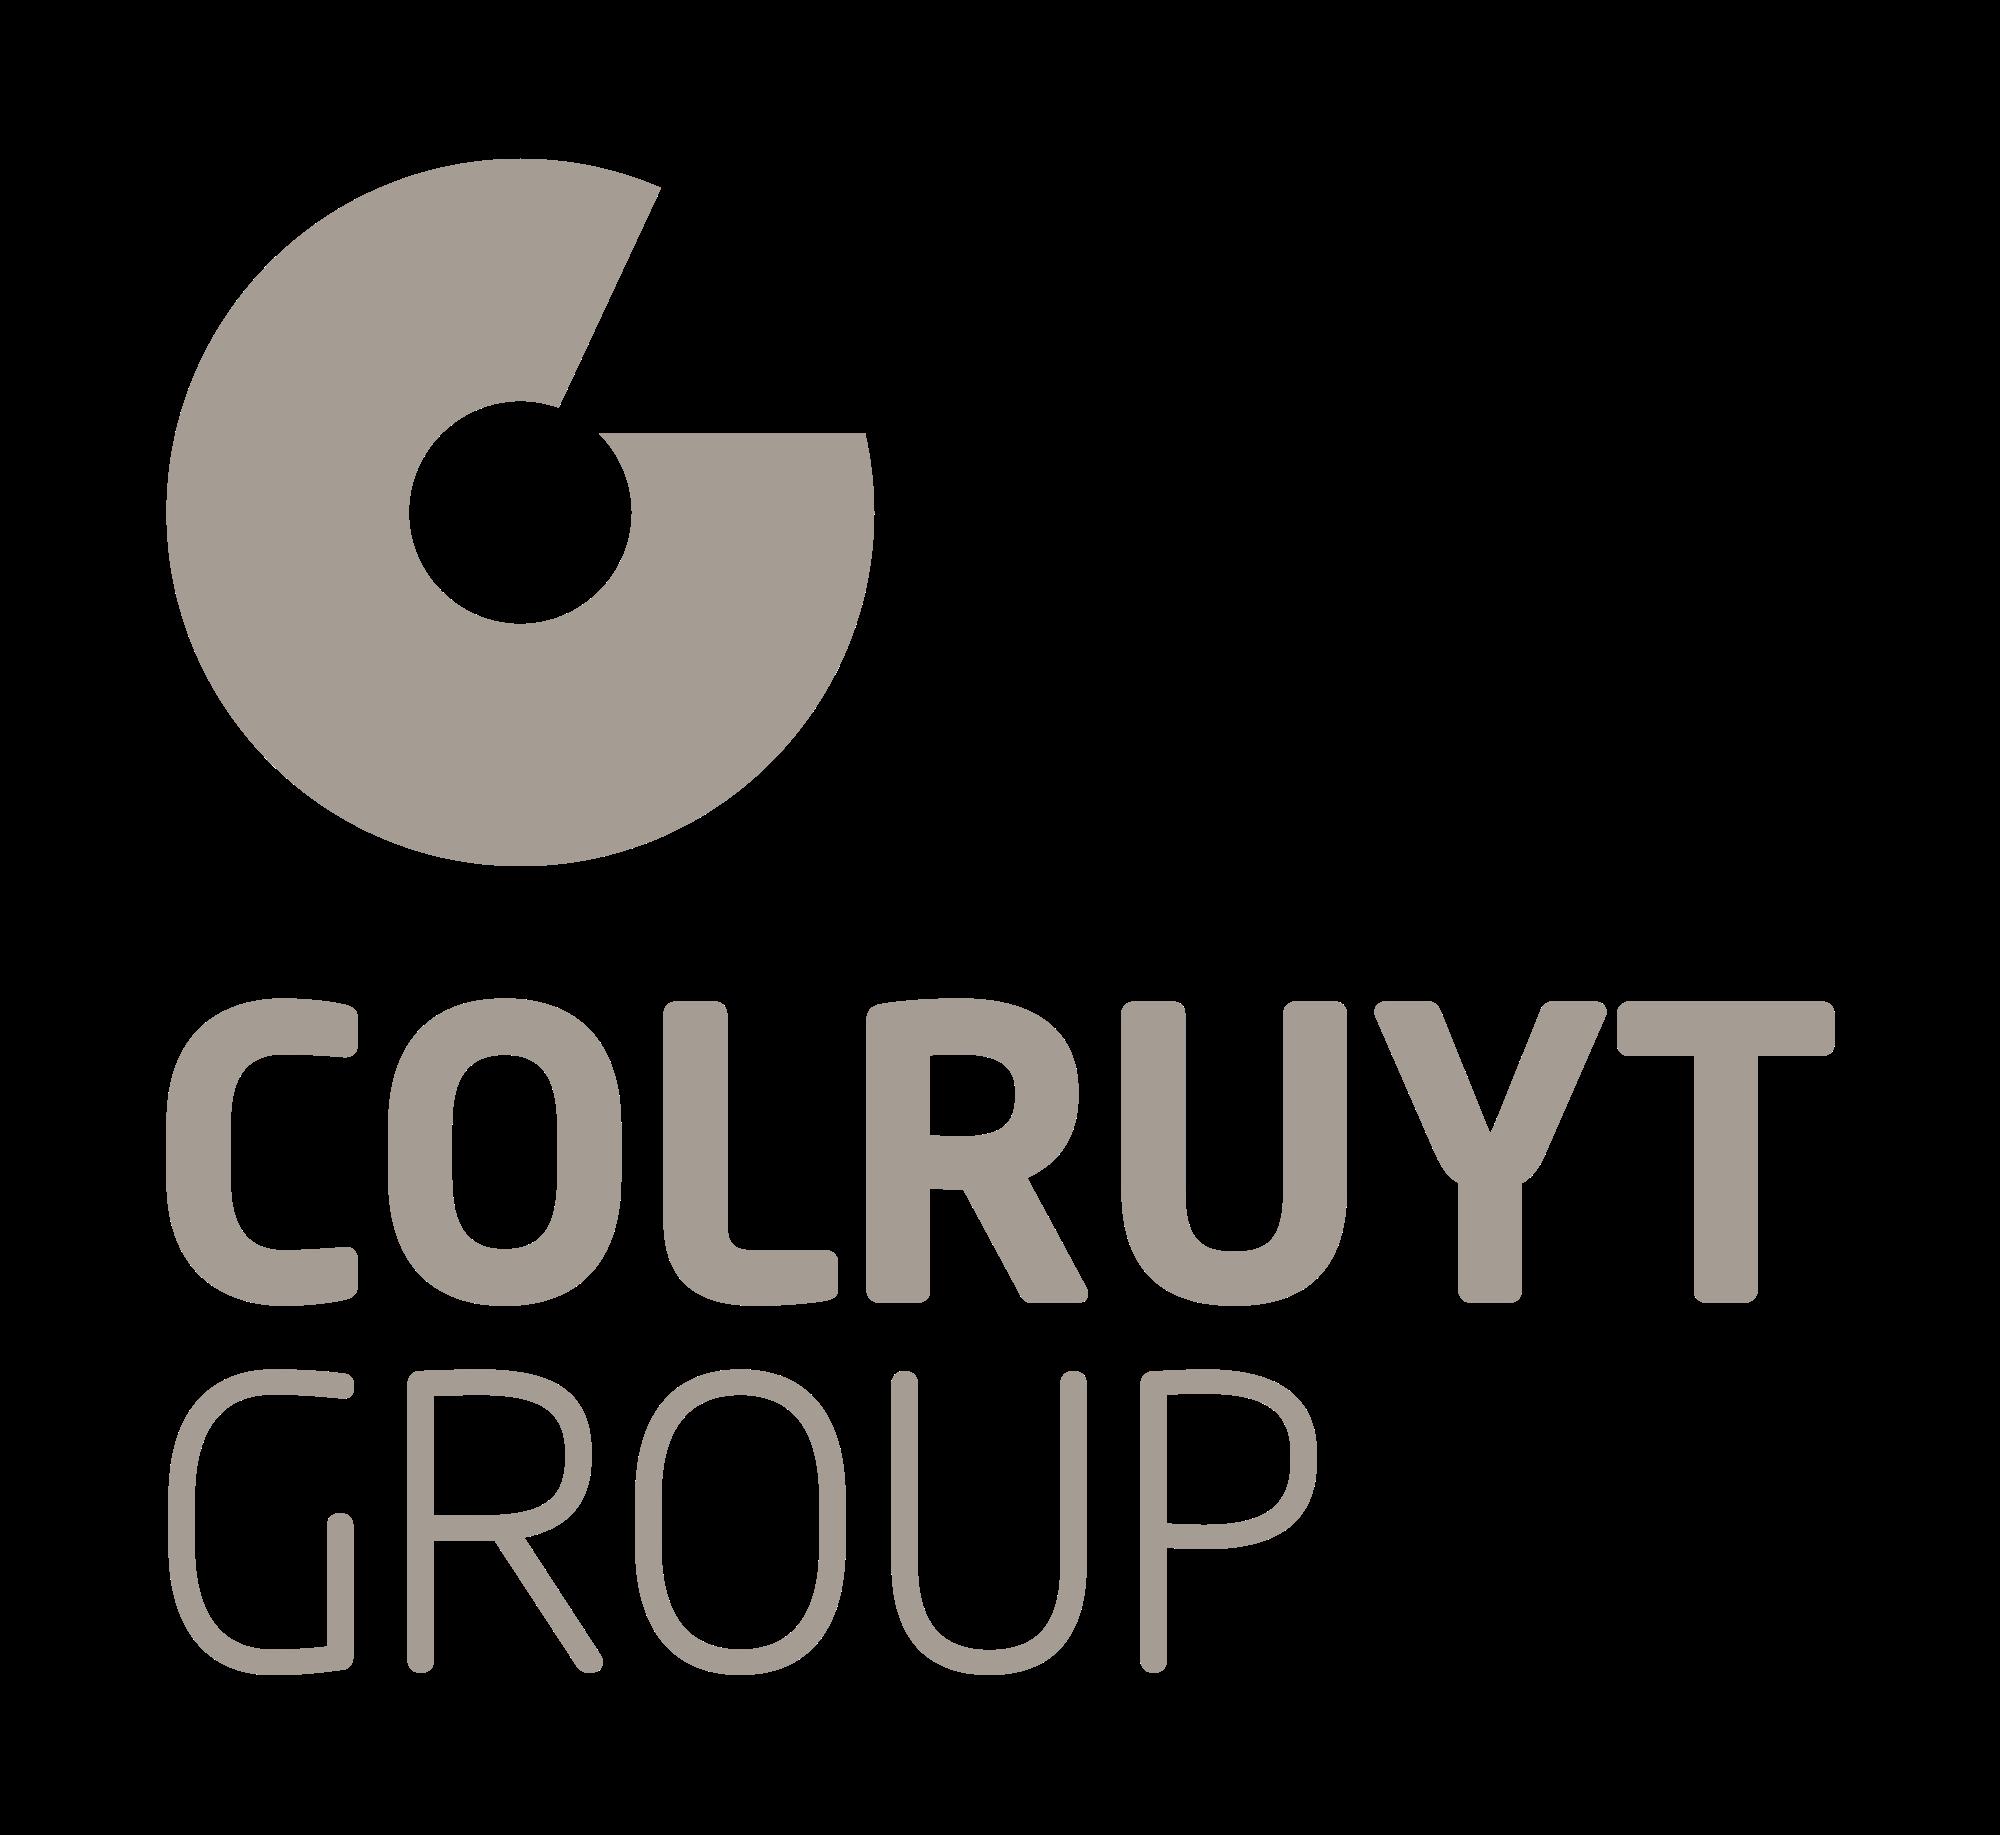 colruyt group.png